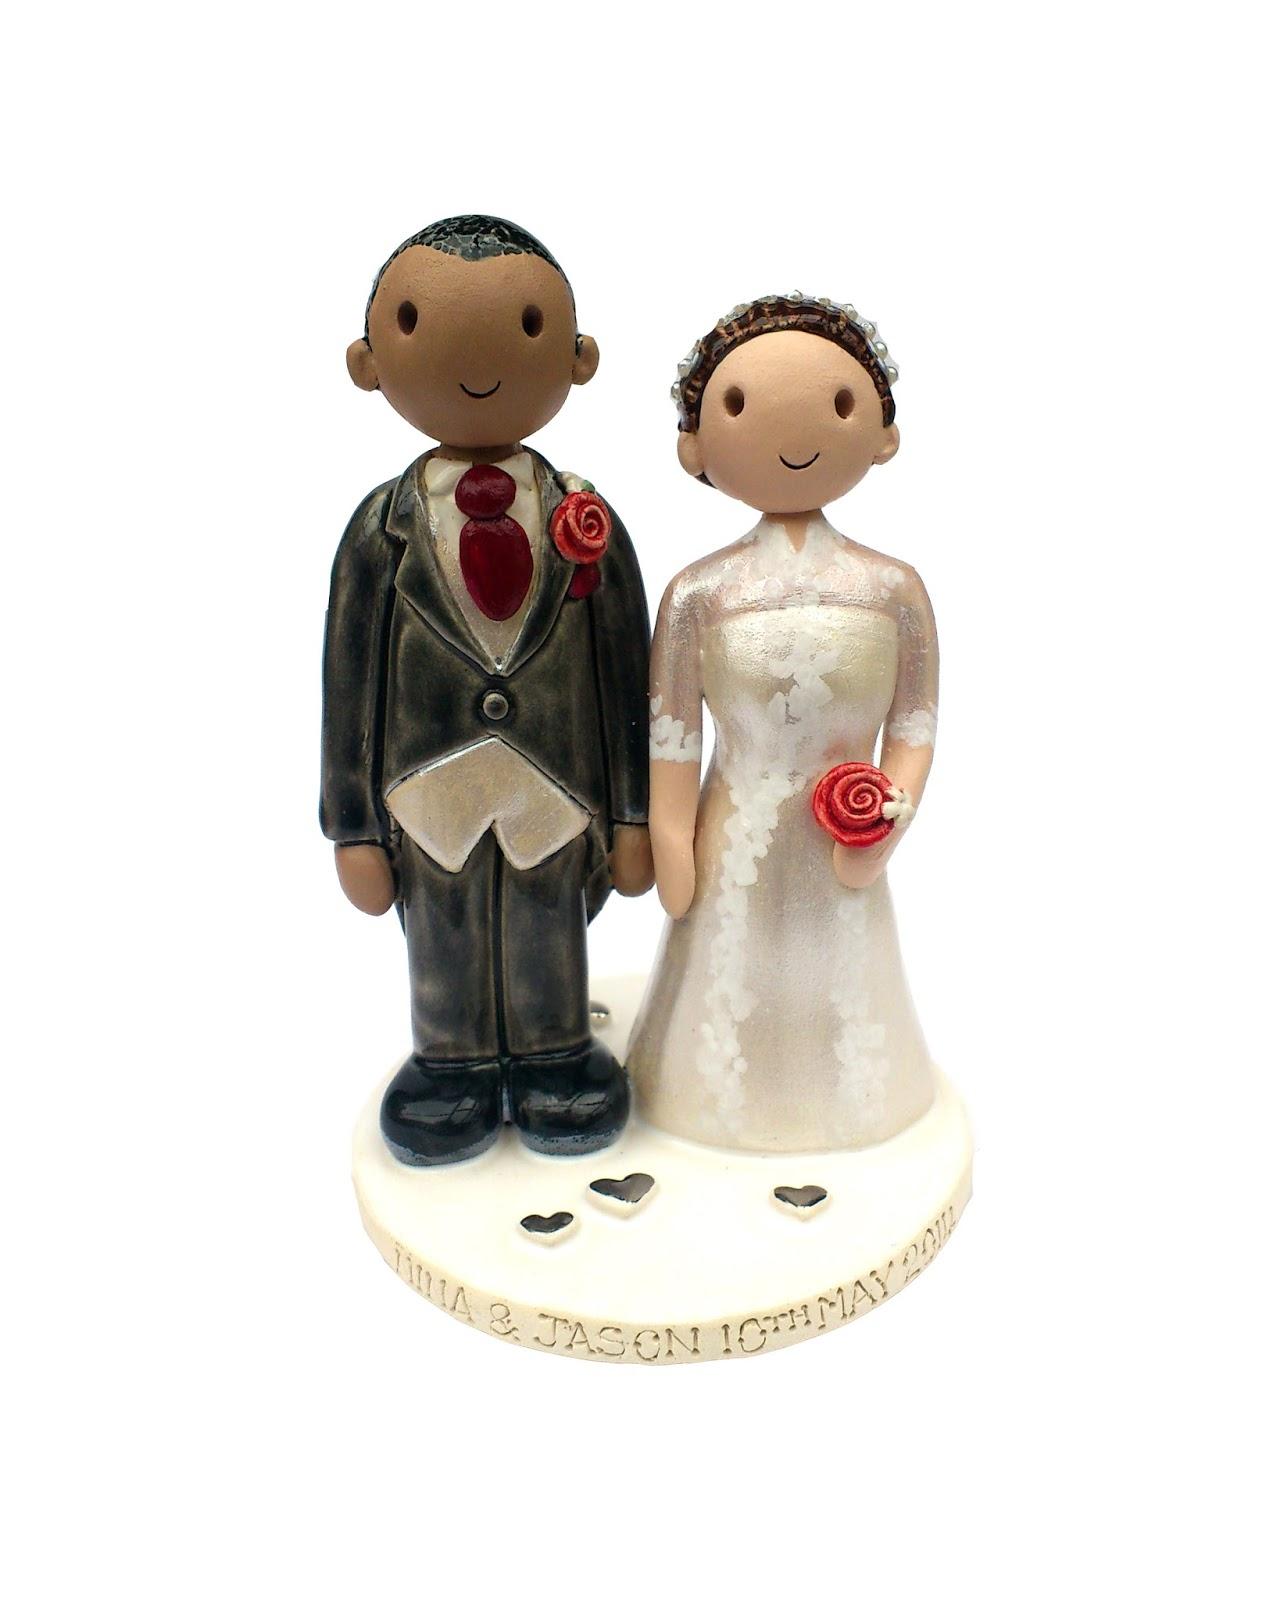 Weddings - Cake Toppers